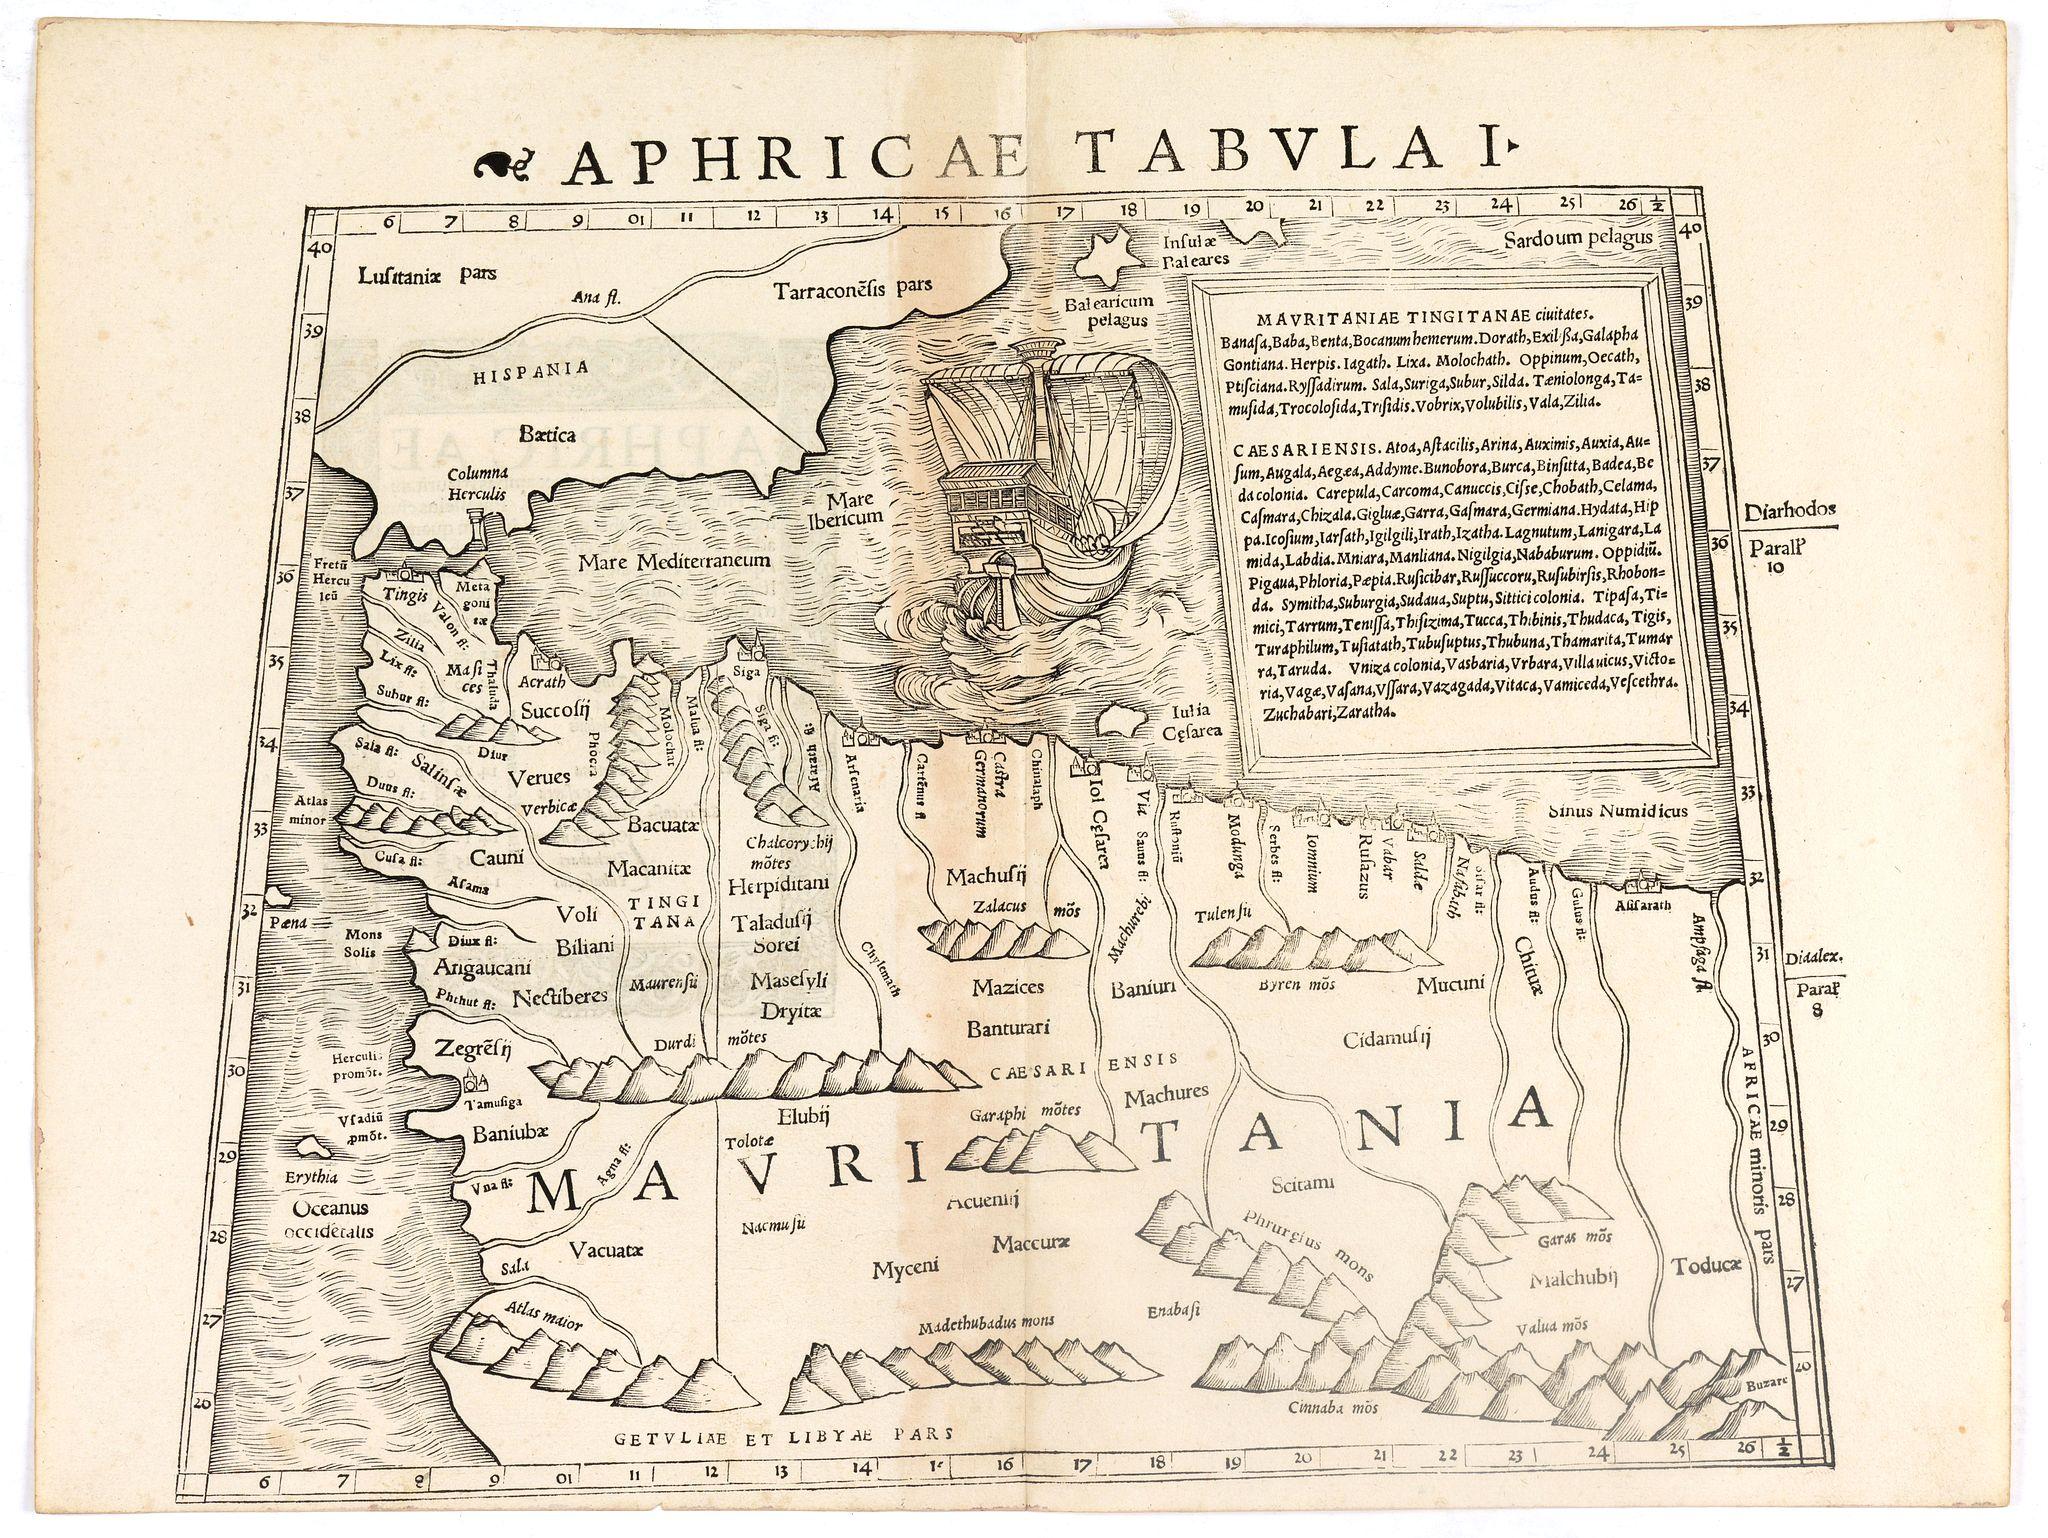 MÜNSTER, S. -  Aphricae Tabula I (Mauritania - present-day Morocco, Algeria, and Tunisia.)